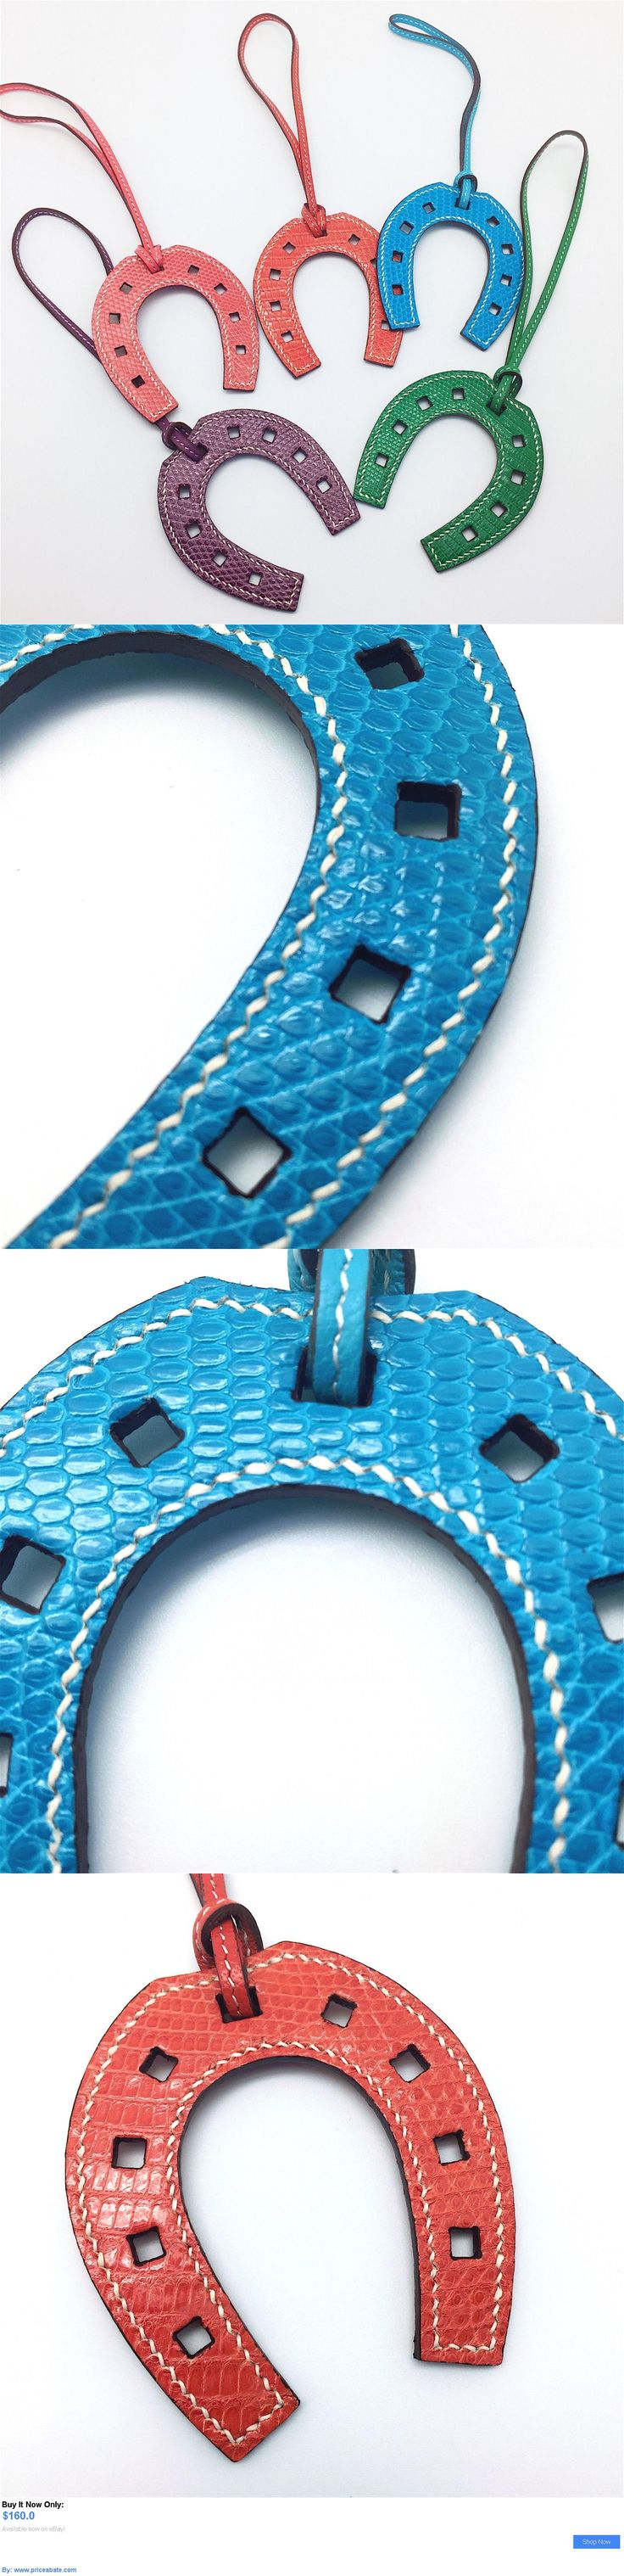 Women Bags And Accessories: Handmade Lizard Skin Horse Shoe Charm Perfect For Hermes Birkin Kelly BUY IT NOW ONLY: $160.0 #priceabateWomenBagsAndAccessories OR #priceabate